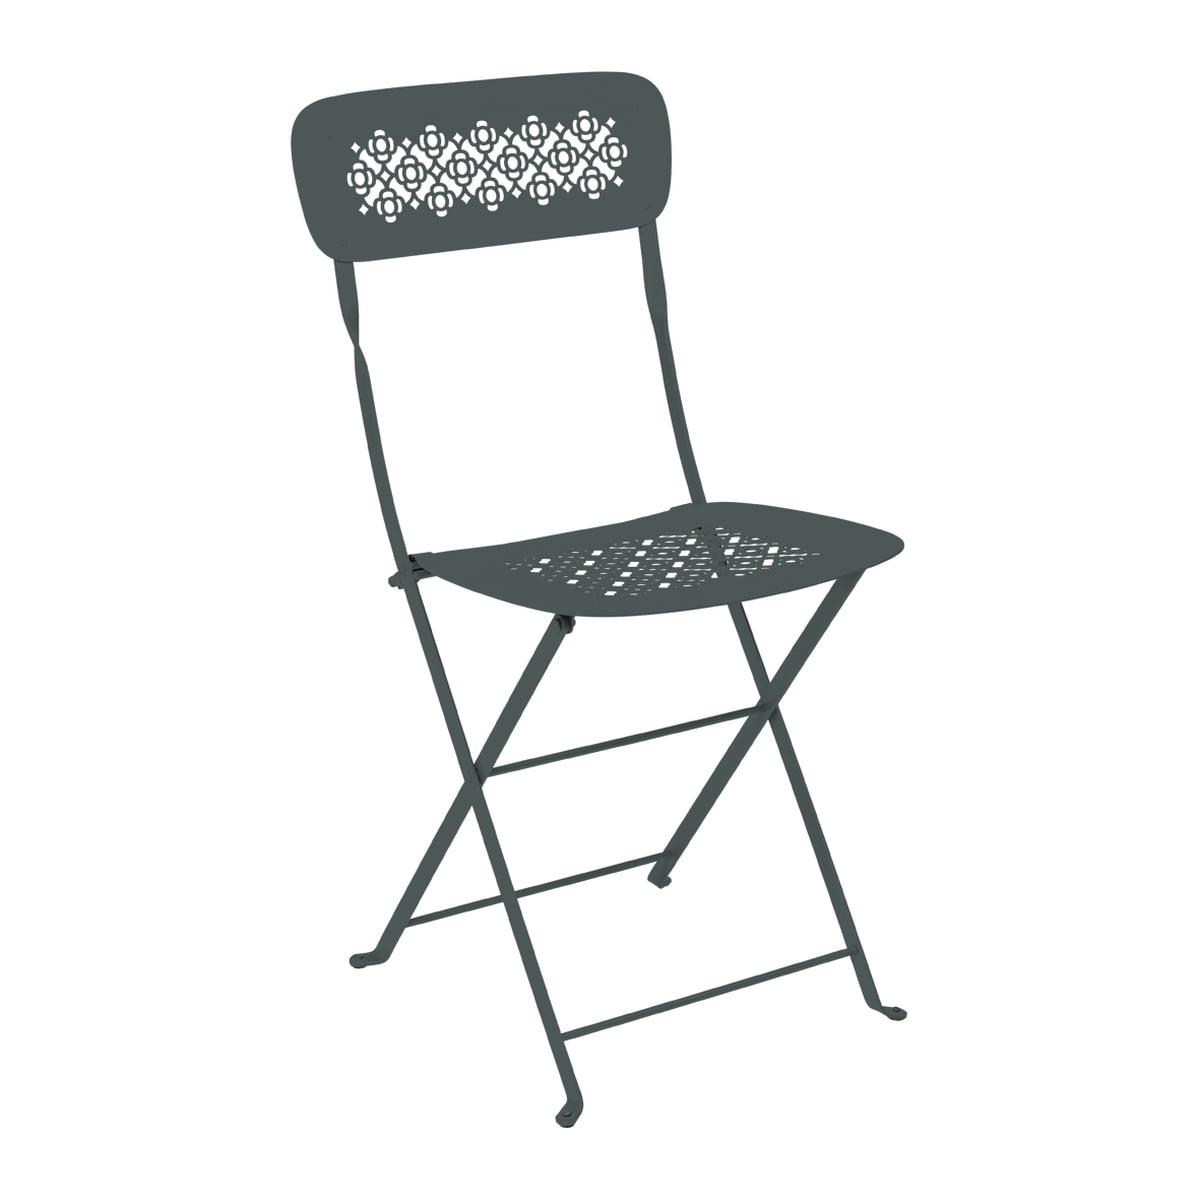 Fermob chaise pliante lorette, gris orage